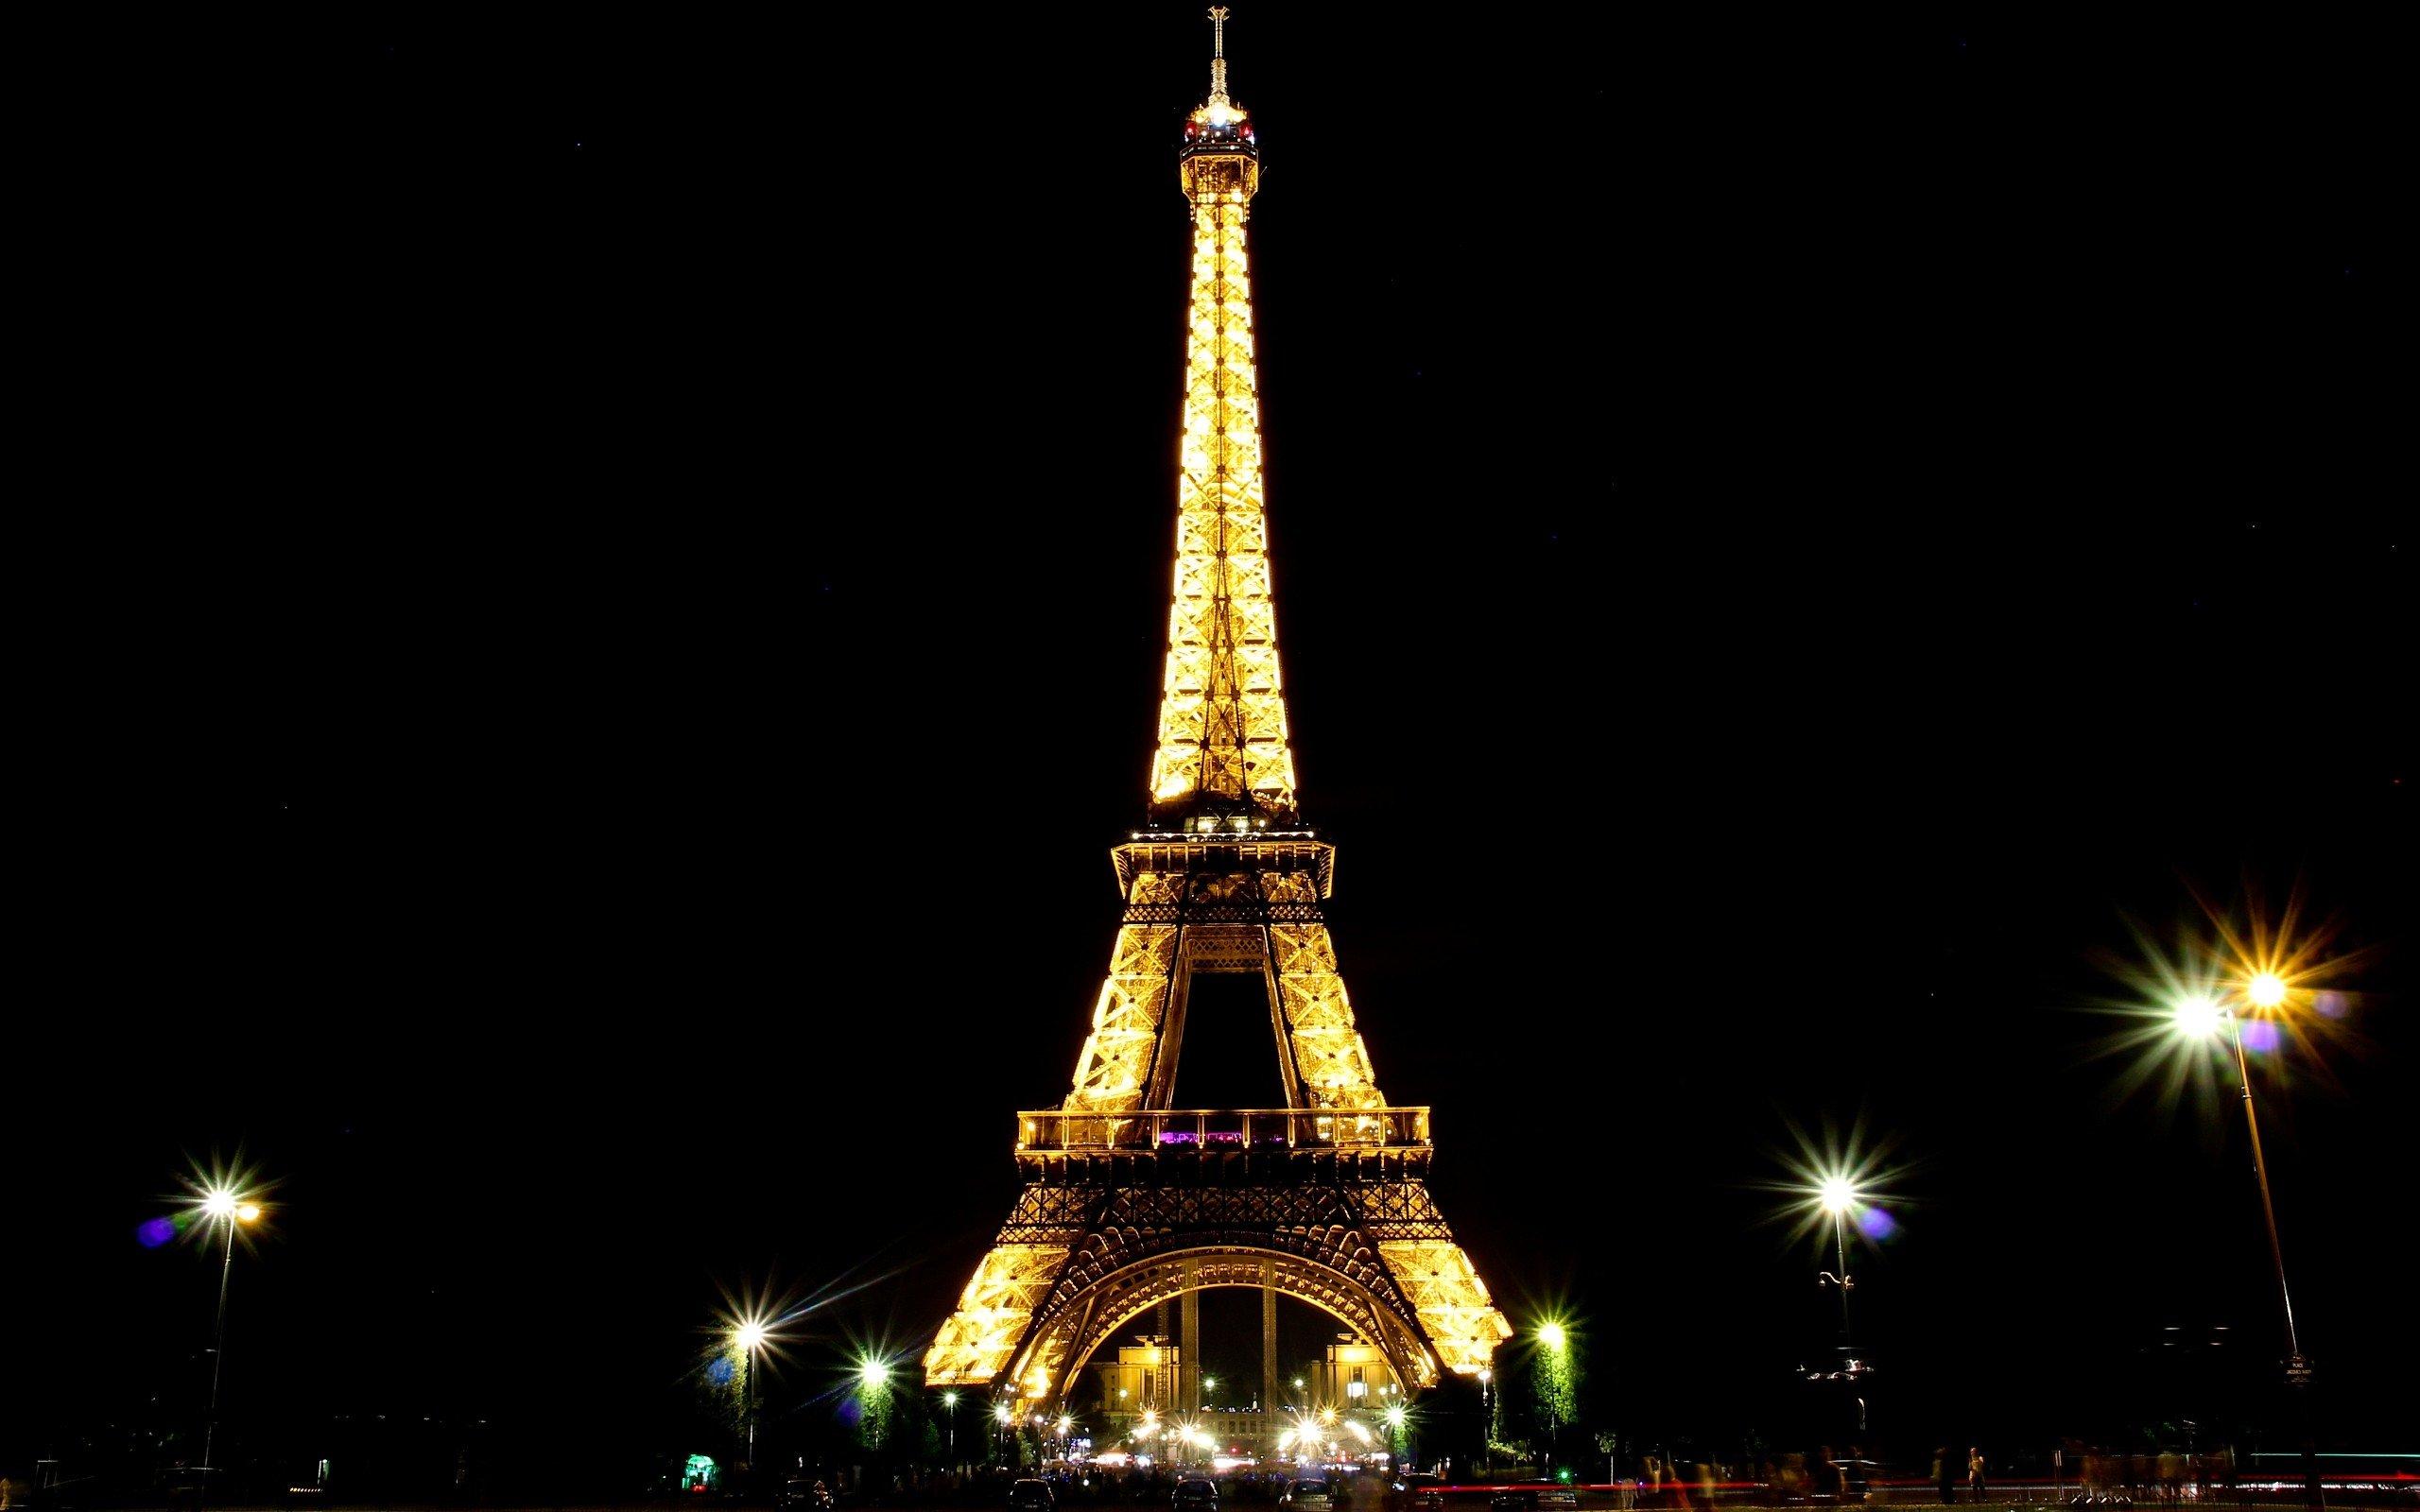 Eiffel Tower Paris Landscapes Night Lights France Skies Light Wallpaper